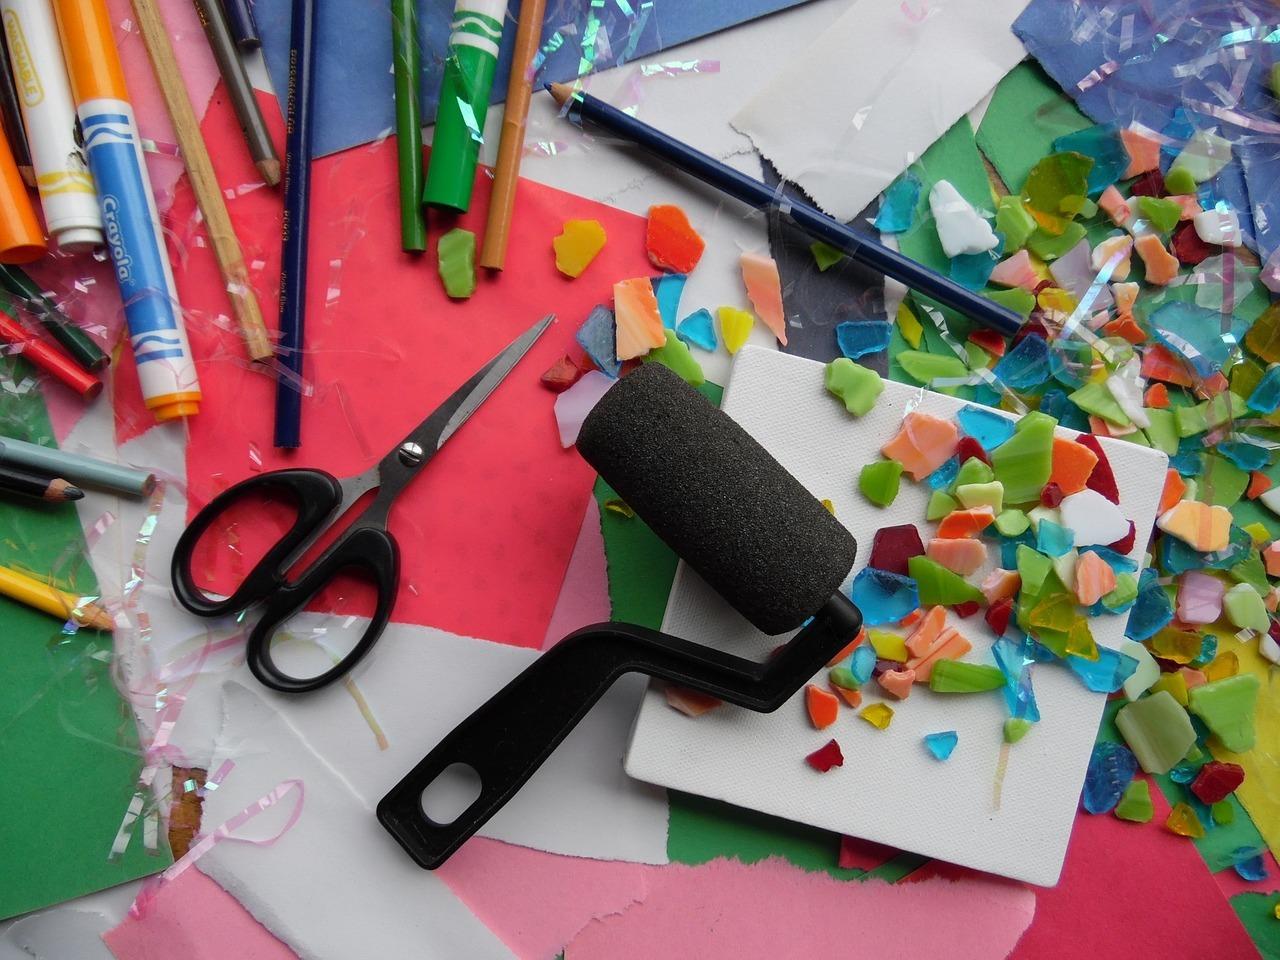 diy-art-ideas-for-cheap-home-decor